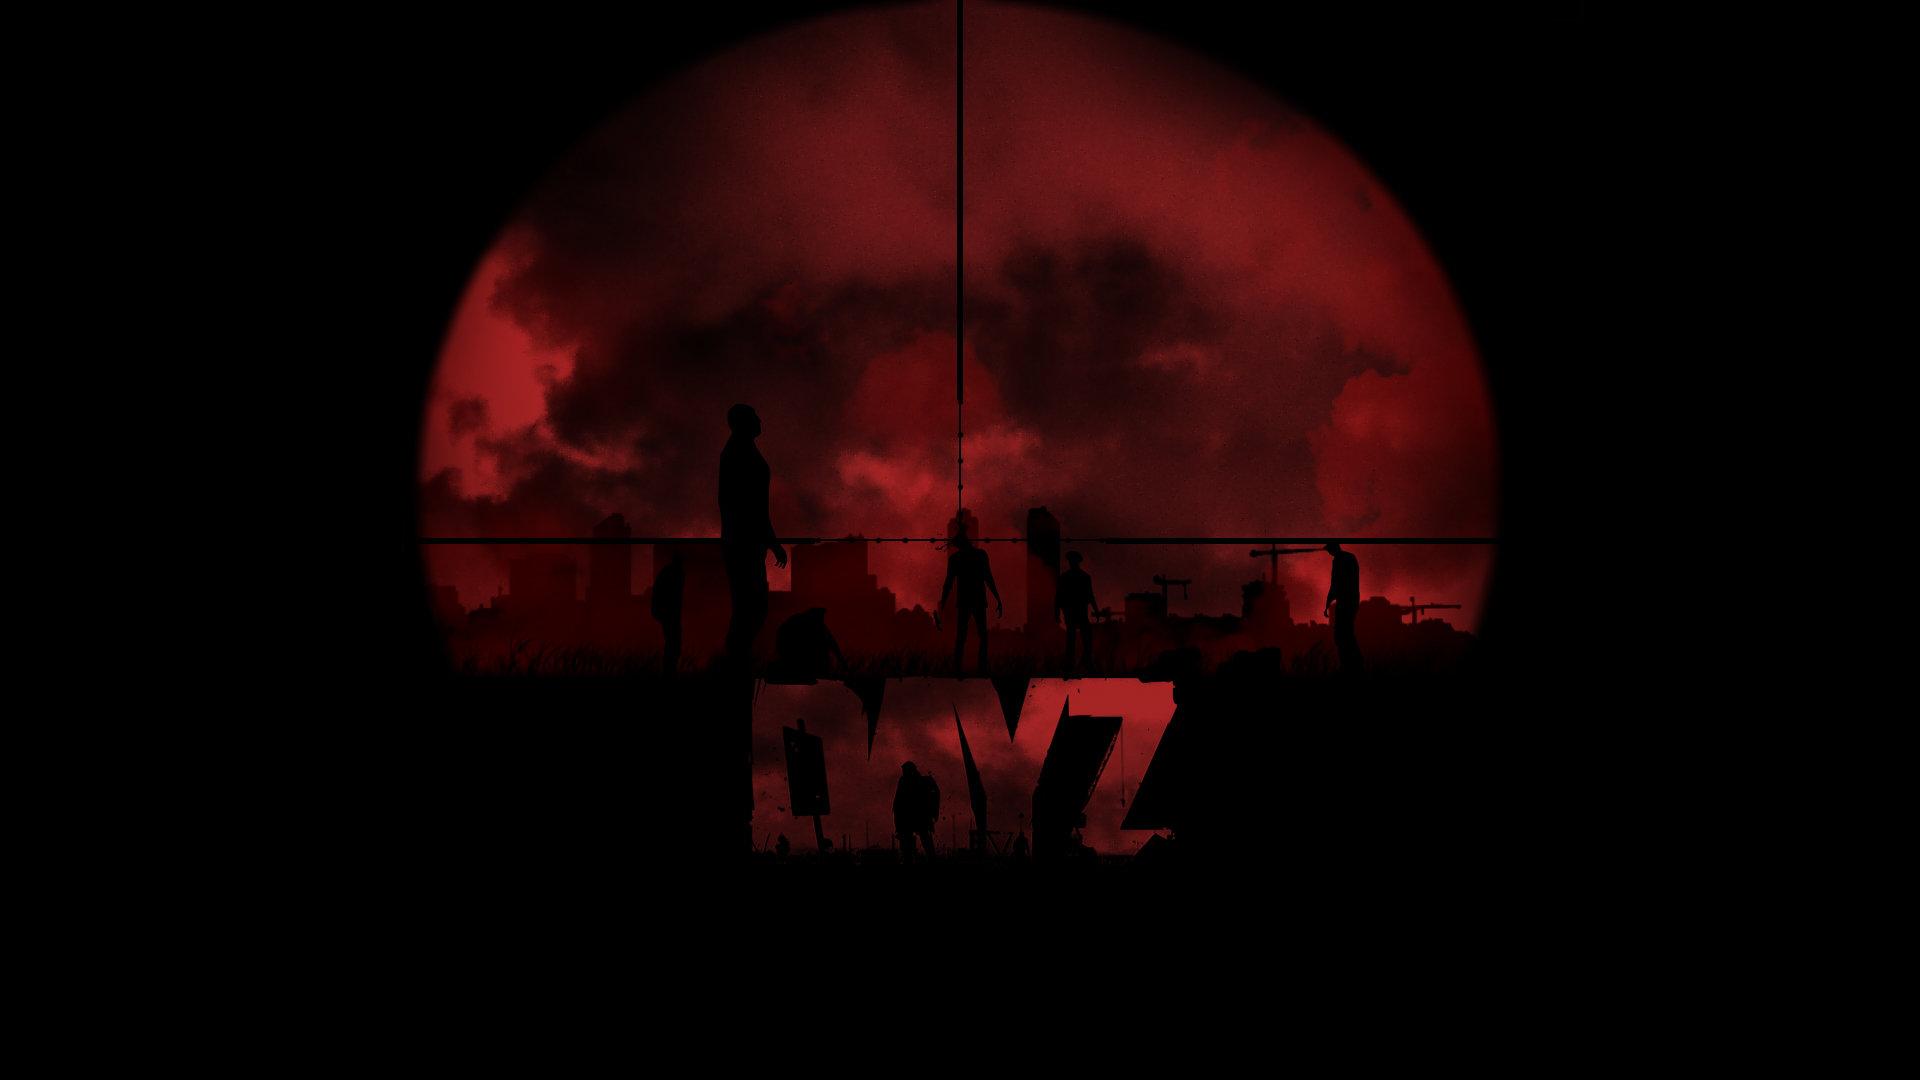 Download Full Hd Dayz Desktop Wallpaper Id363479 For Free